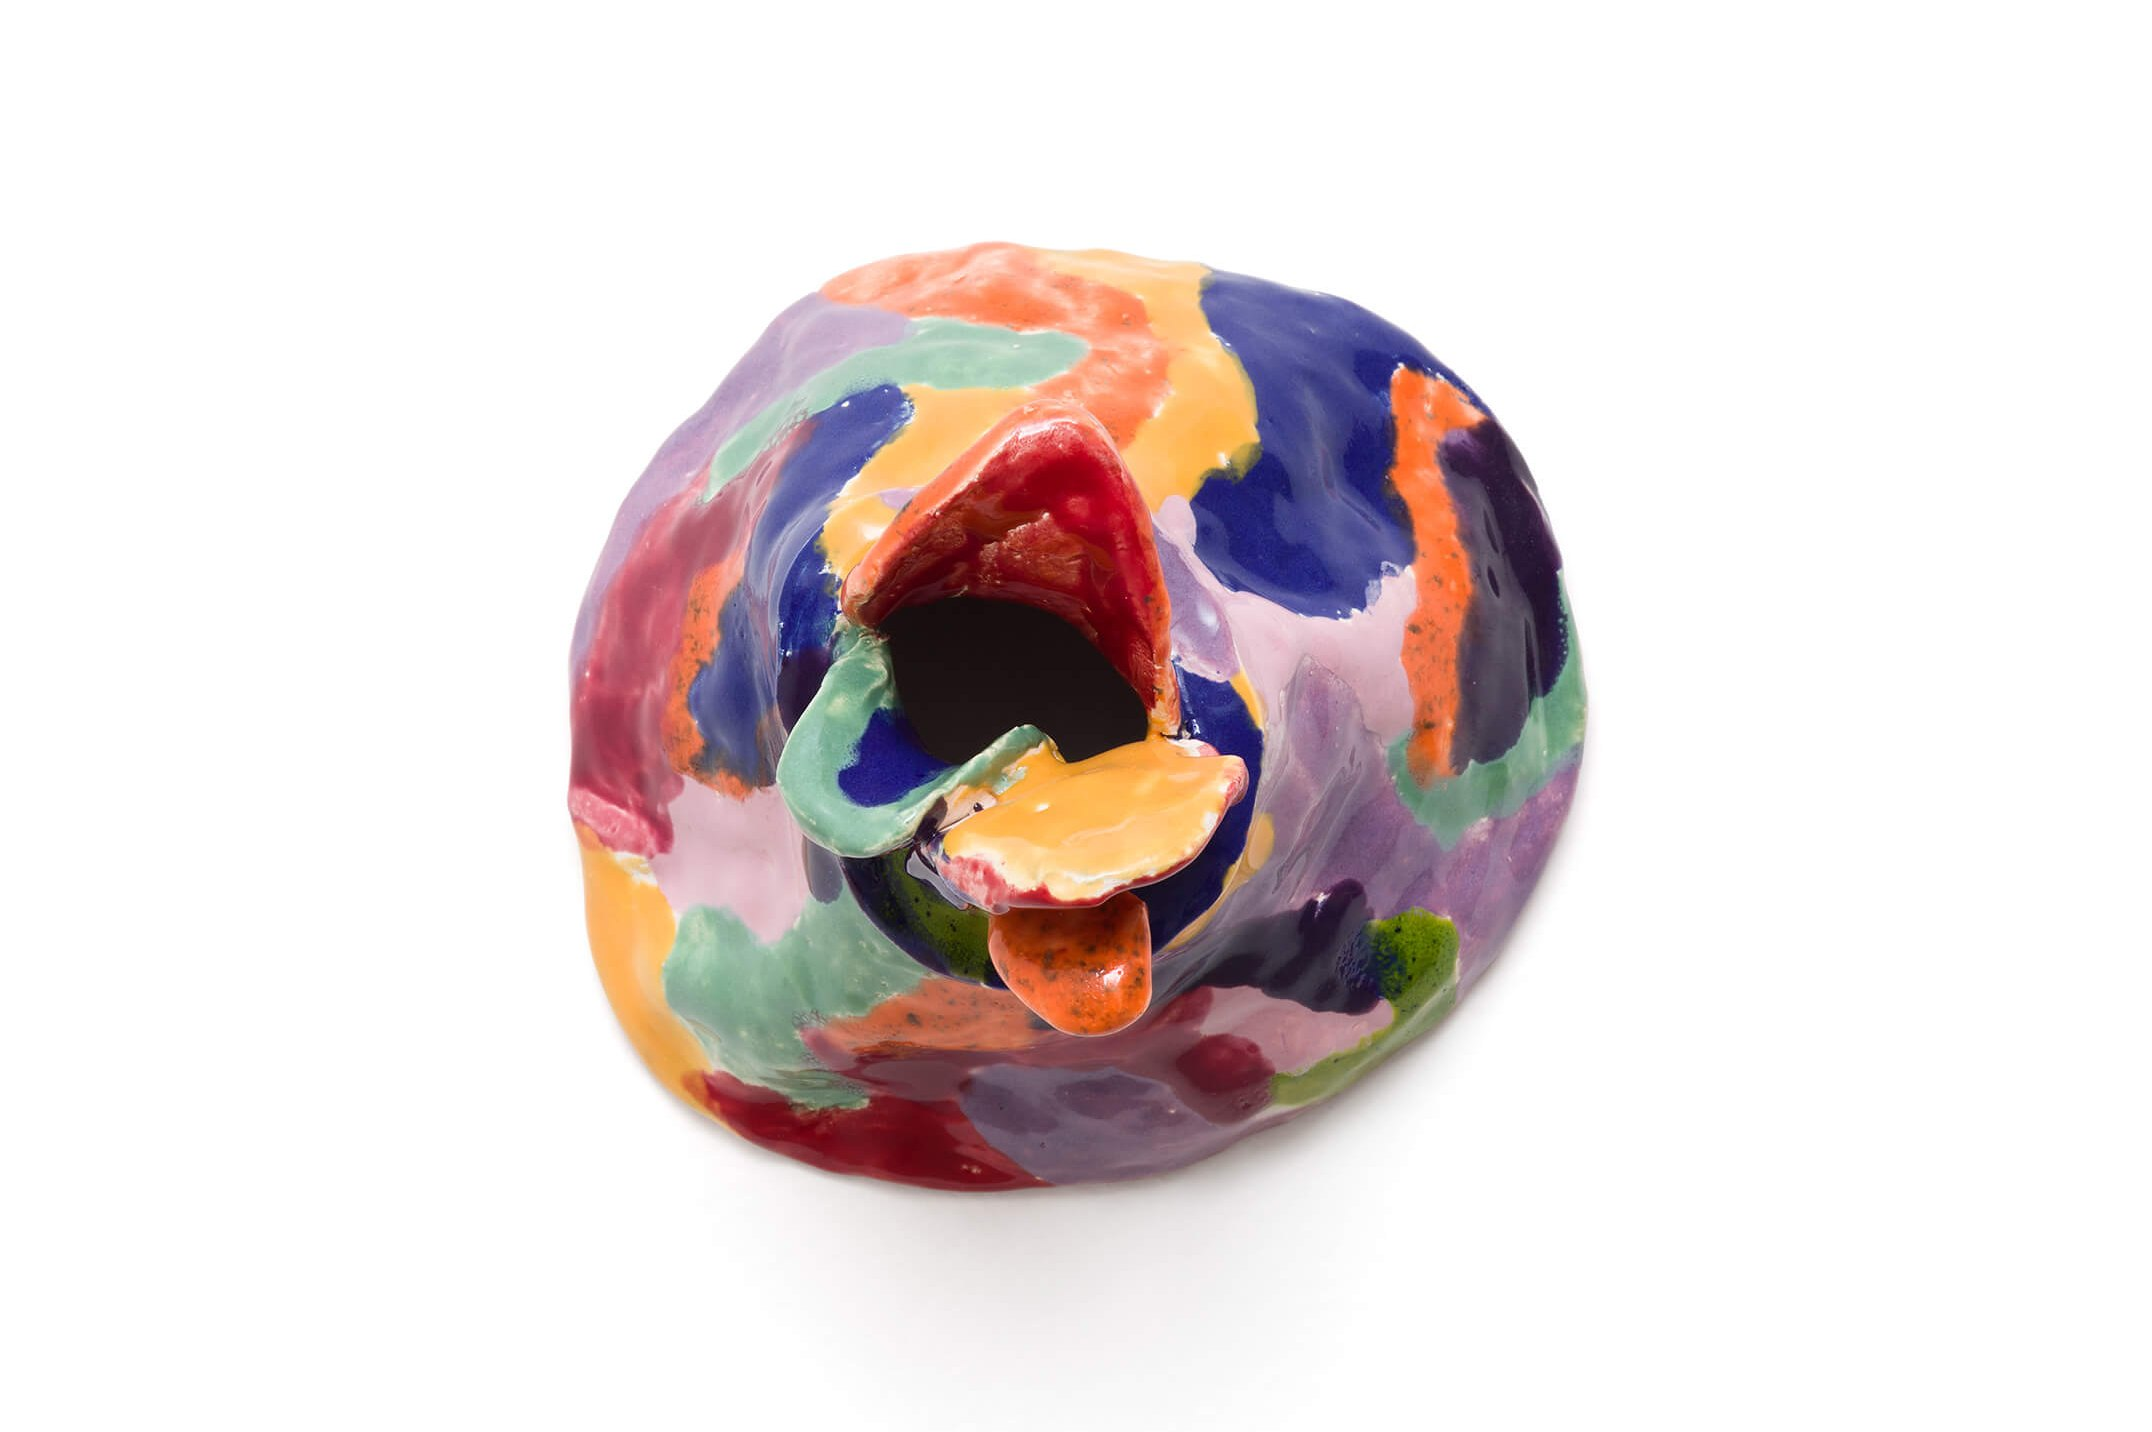 Cibelle Cavalli Bastos,<em>Linguardurx I</em>, 2016, enamelled ceramic, 17 × 17 × 15 cm - Mendes Wood DM